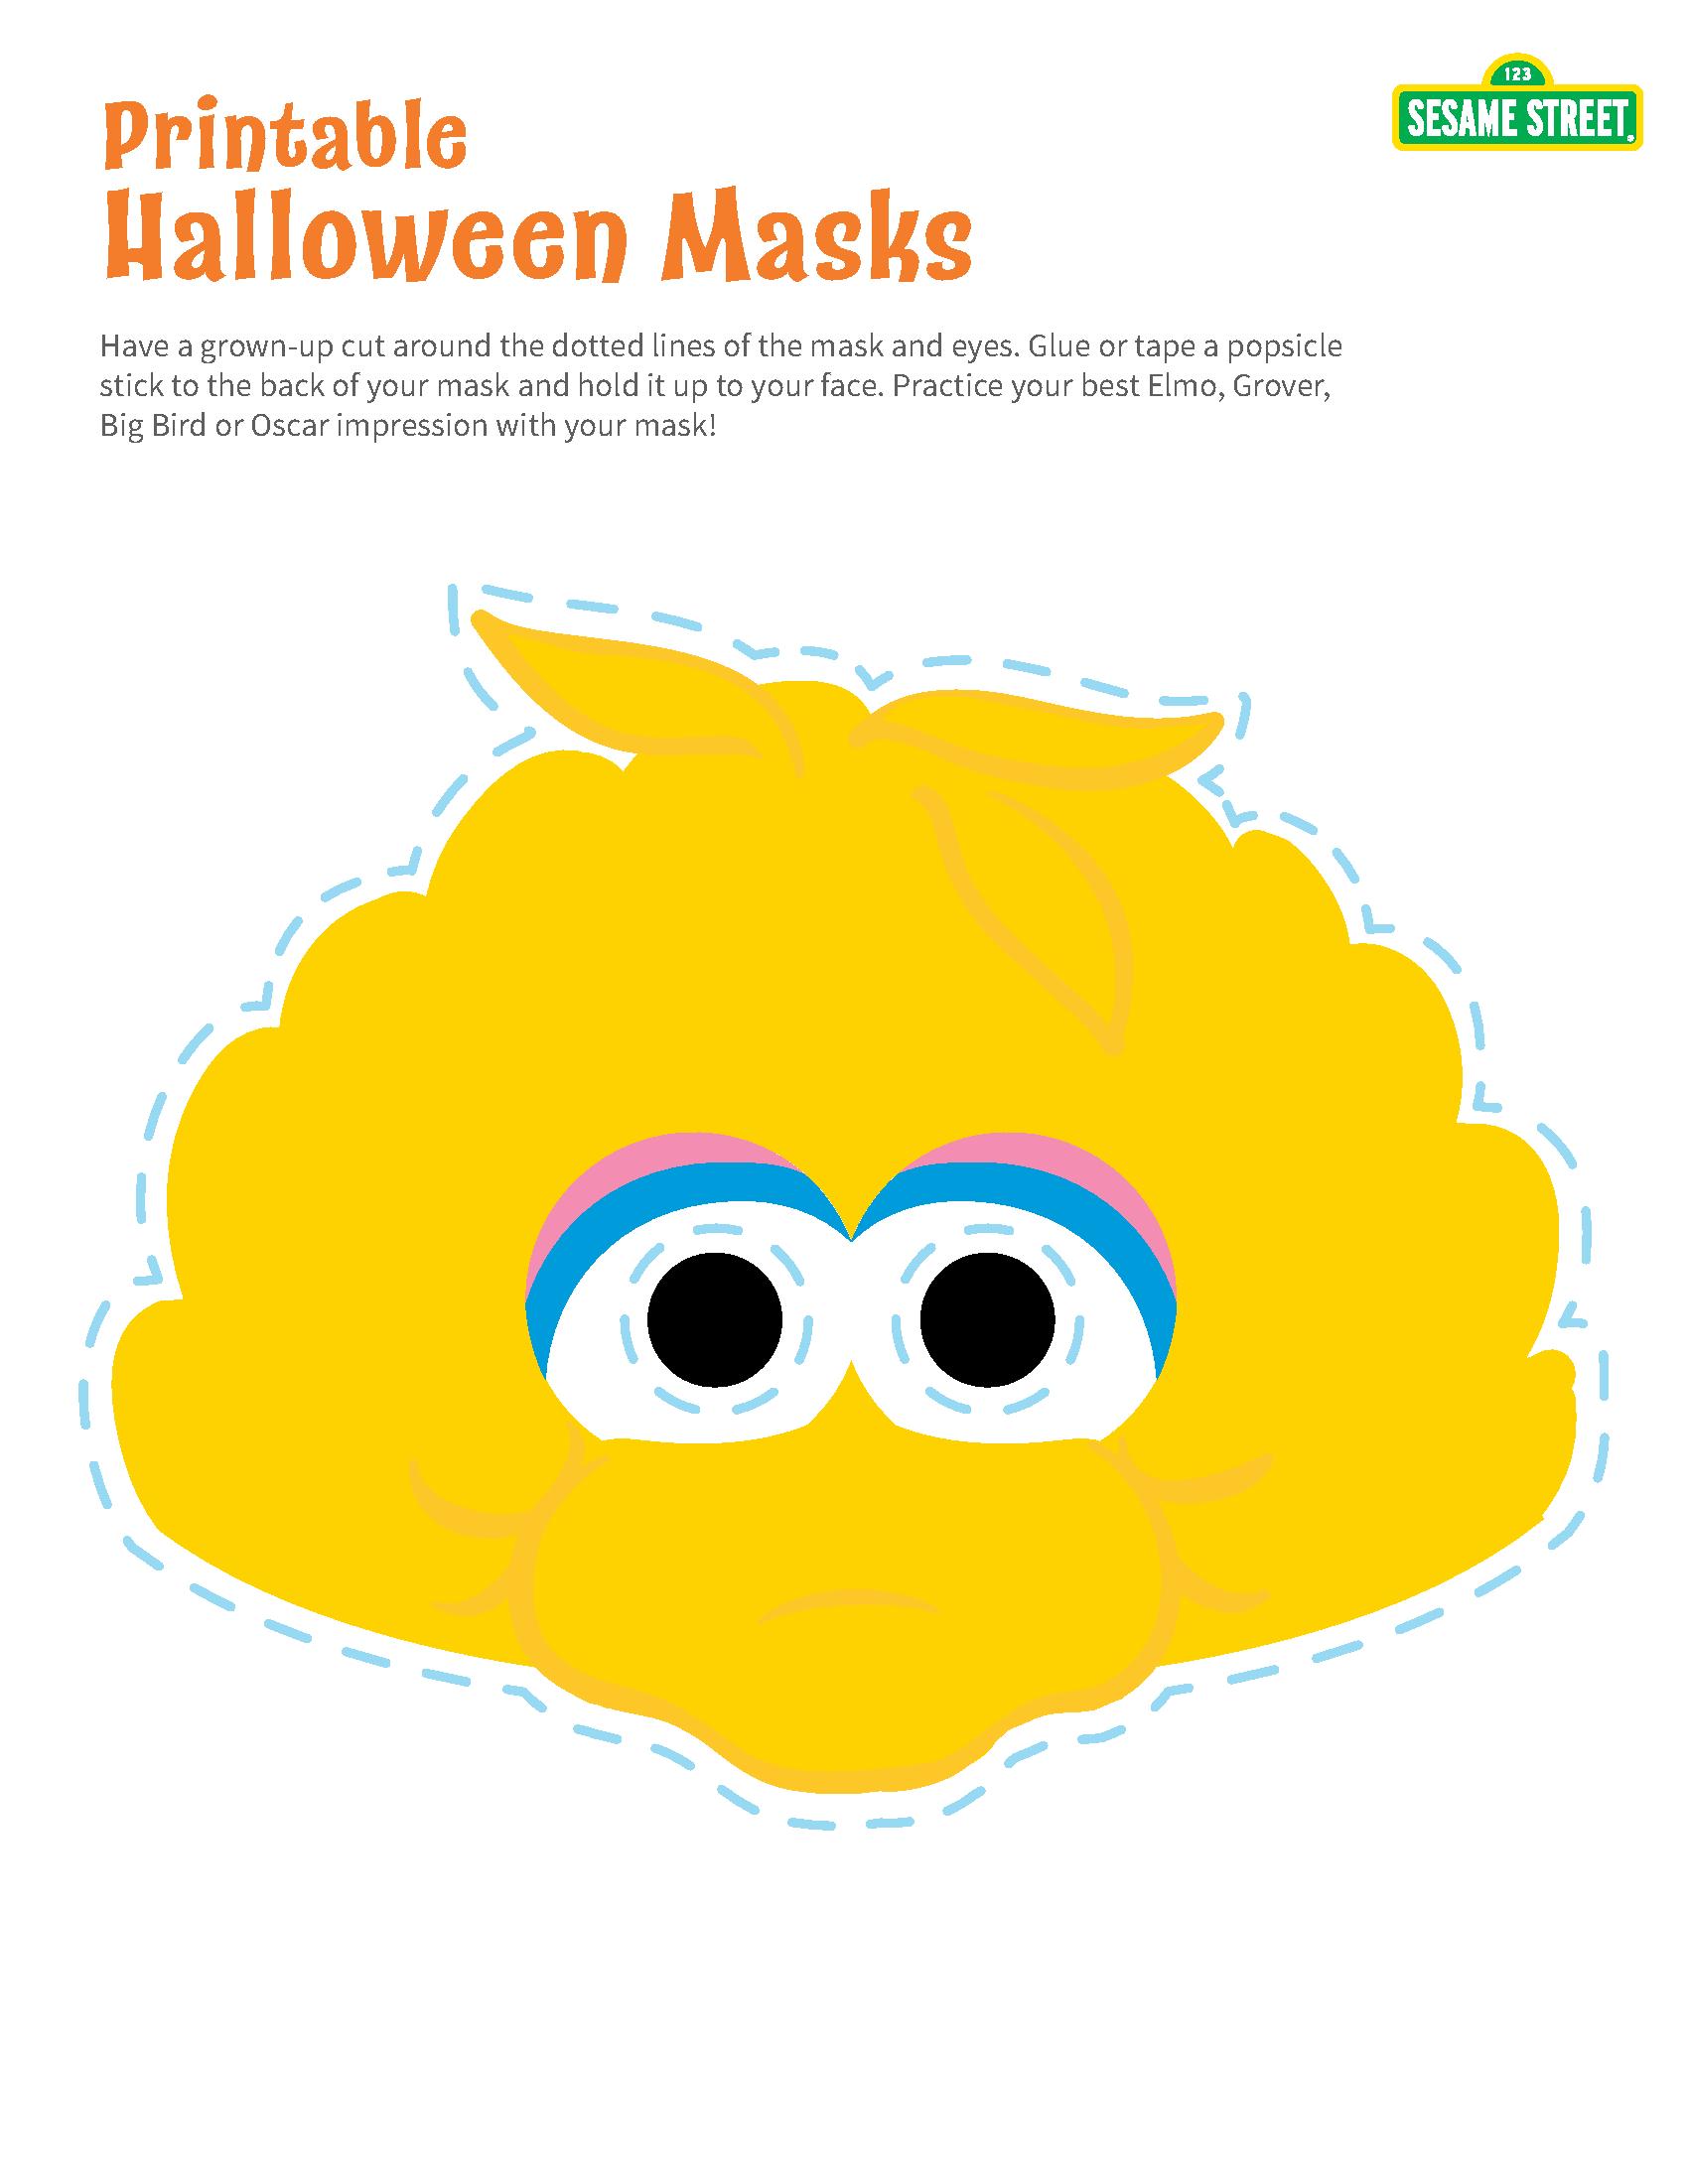 photo regarding Sesame Street Printable Faces named Artwork Sesame Road PBSKids